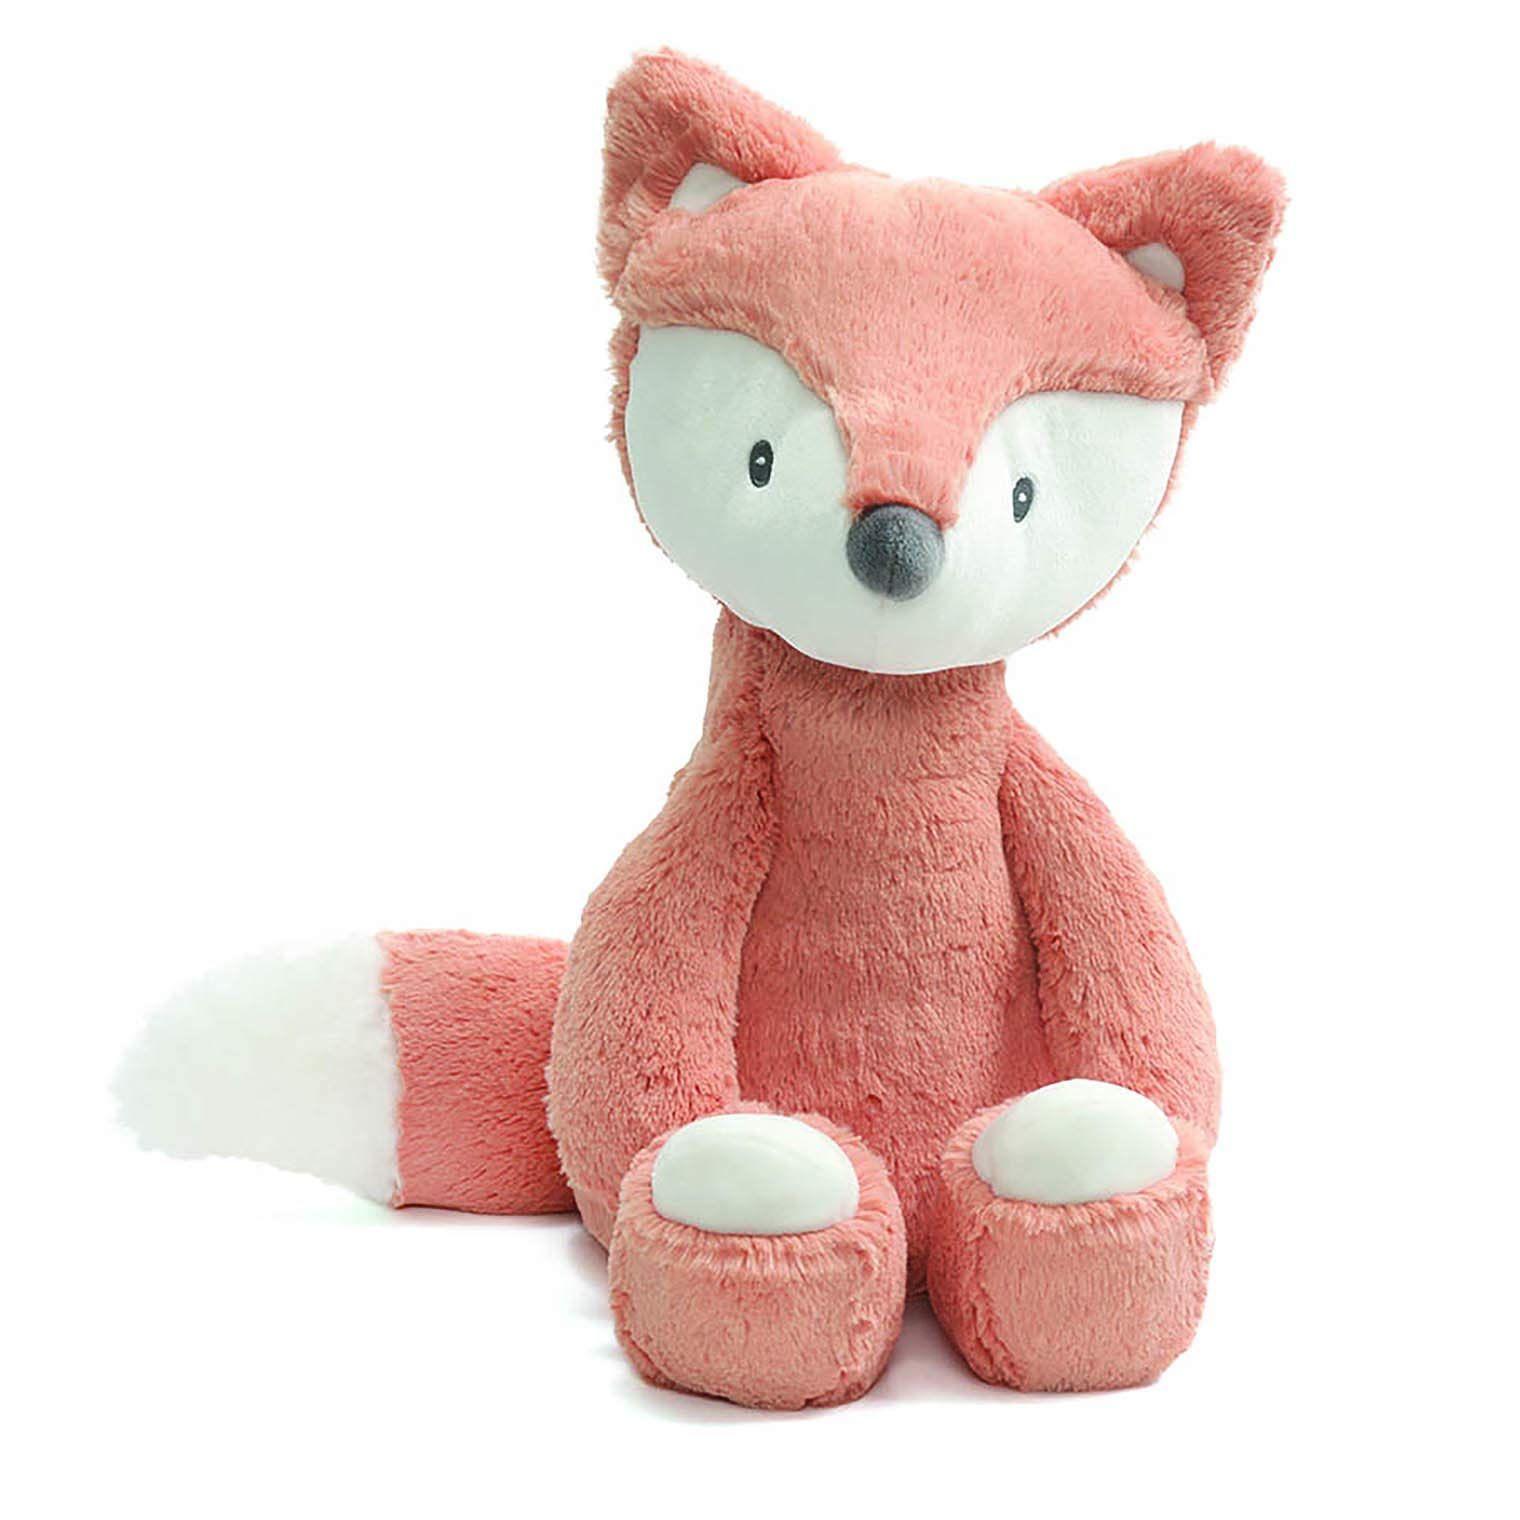 Gund Baby Baby Toothpick Plush Stuffed Fox 16 Walmart Com Fox Stuffed Animal Fox Plush Toy Plush Stuffed Animals [ 1520 x 1520 Pixel ]